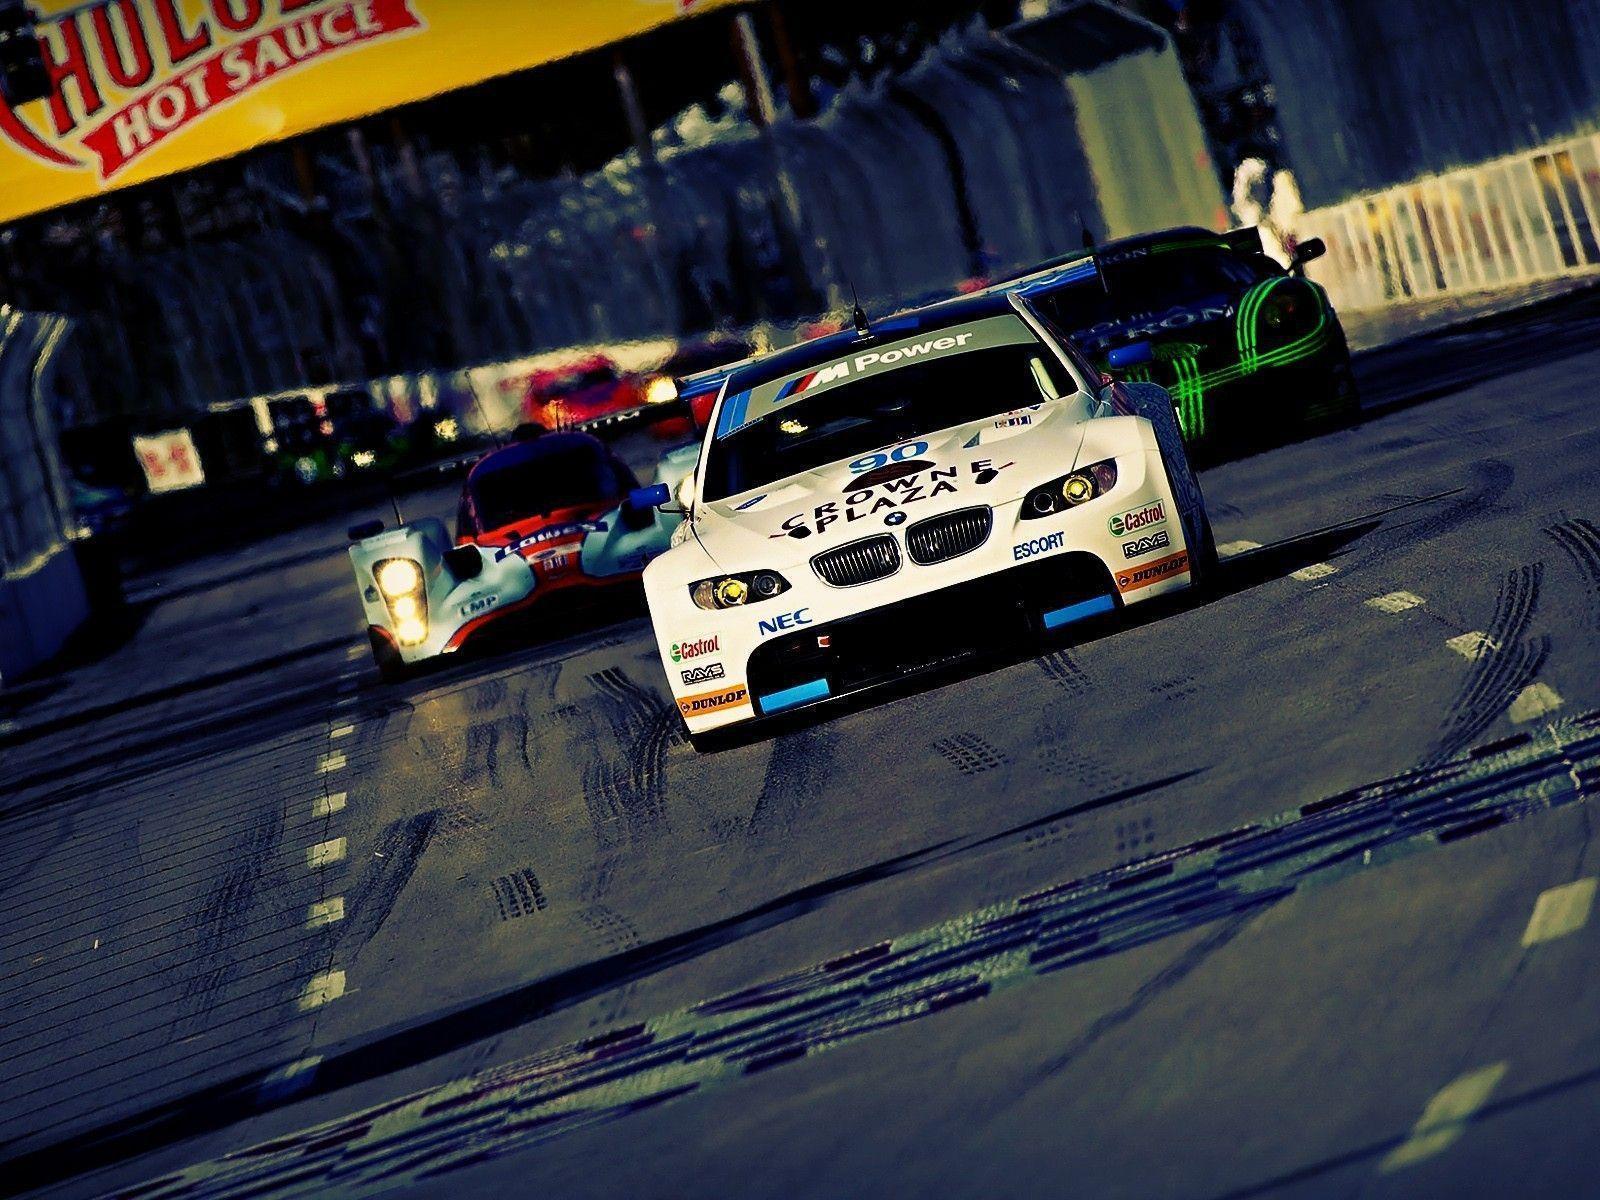 Bmw m3 gt2 le mans racing cars wallpaper | AllWallpaper.in #3255 ...